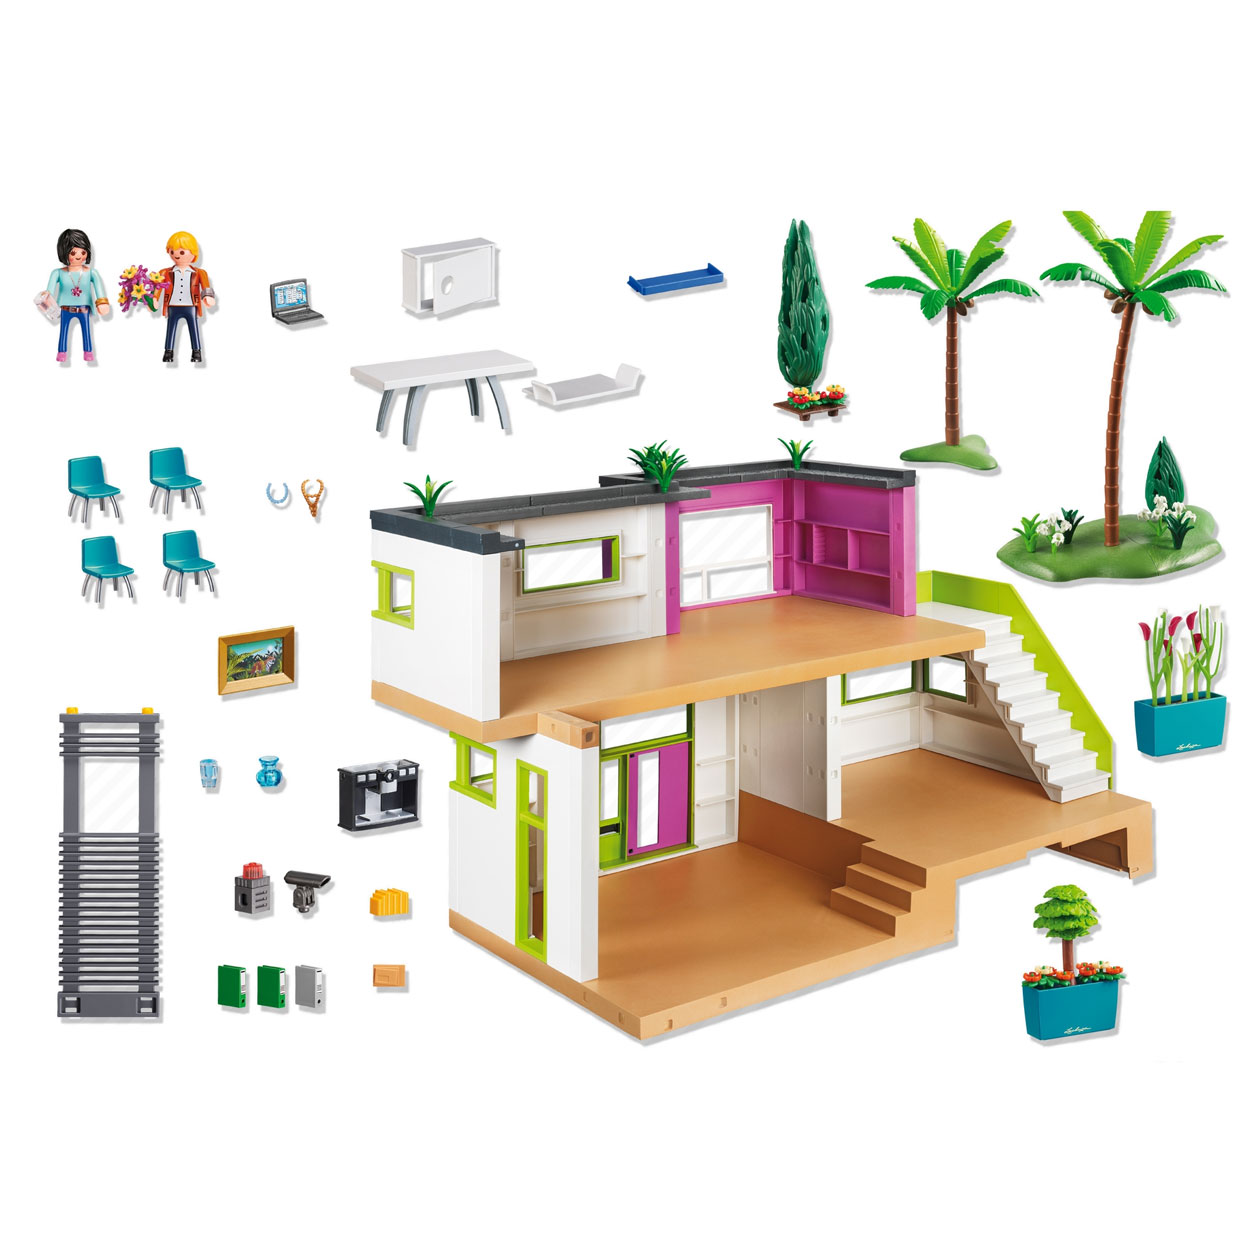 Playmobil 5574 luxe villa online kopen for Casa moderna de lujo playmobil